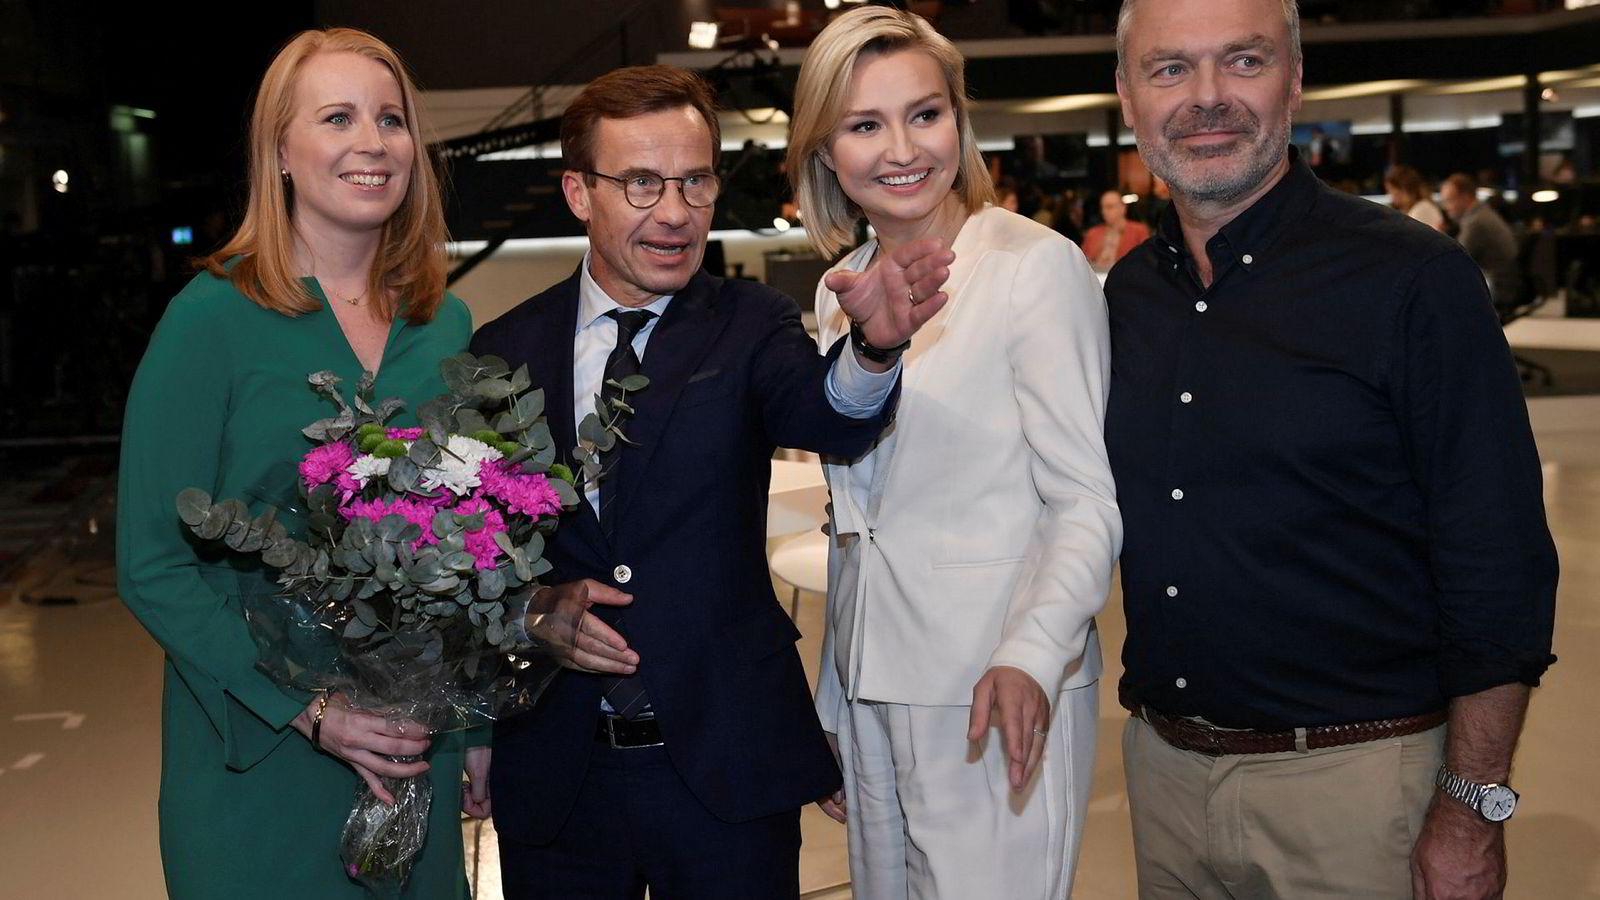 På valgnatten samlet partilederne seg og deltok i SVTs valgstudio. Den borgerlige «Alliansen» består av Annie Lööf (fra venstre) (Centerpartiet), Ulf Kristersson (Moderaterna), Ebba Busch Thor (Kristdemokraterna) og  Jan Björklund (Liberalerna).